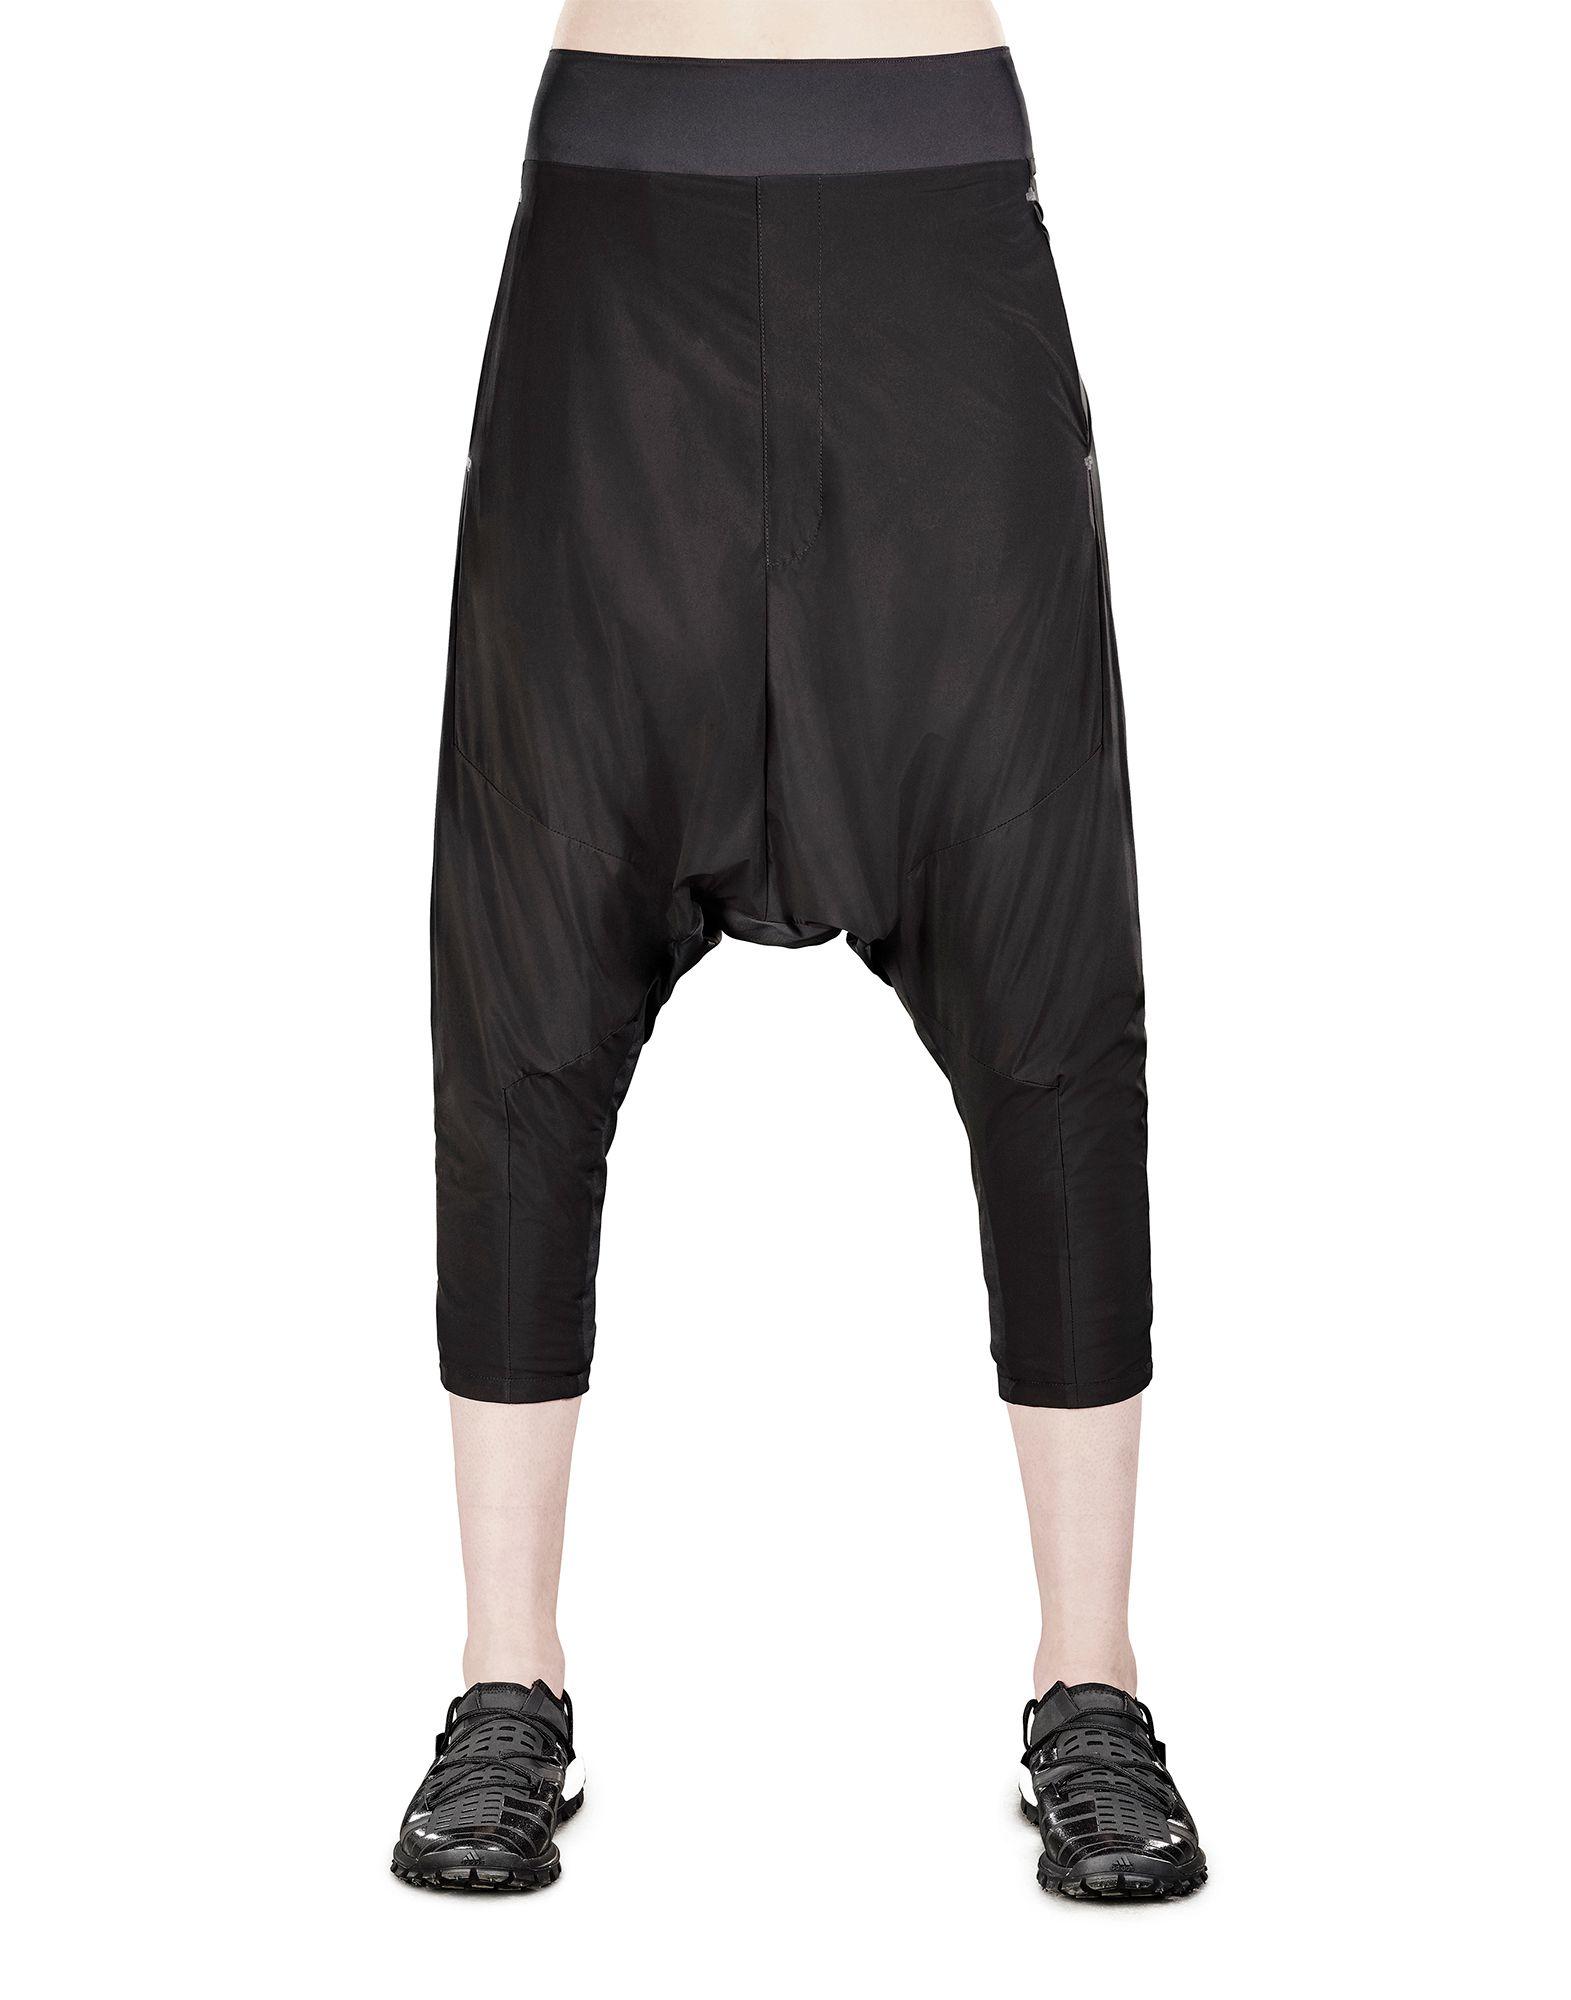 Y-3 SPORT APPROACH PANT W PANTS woman Y-3 adidas